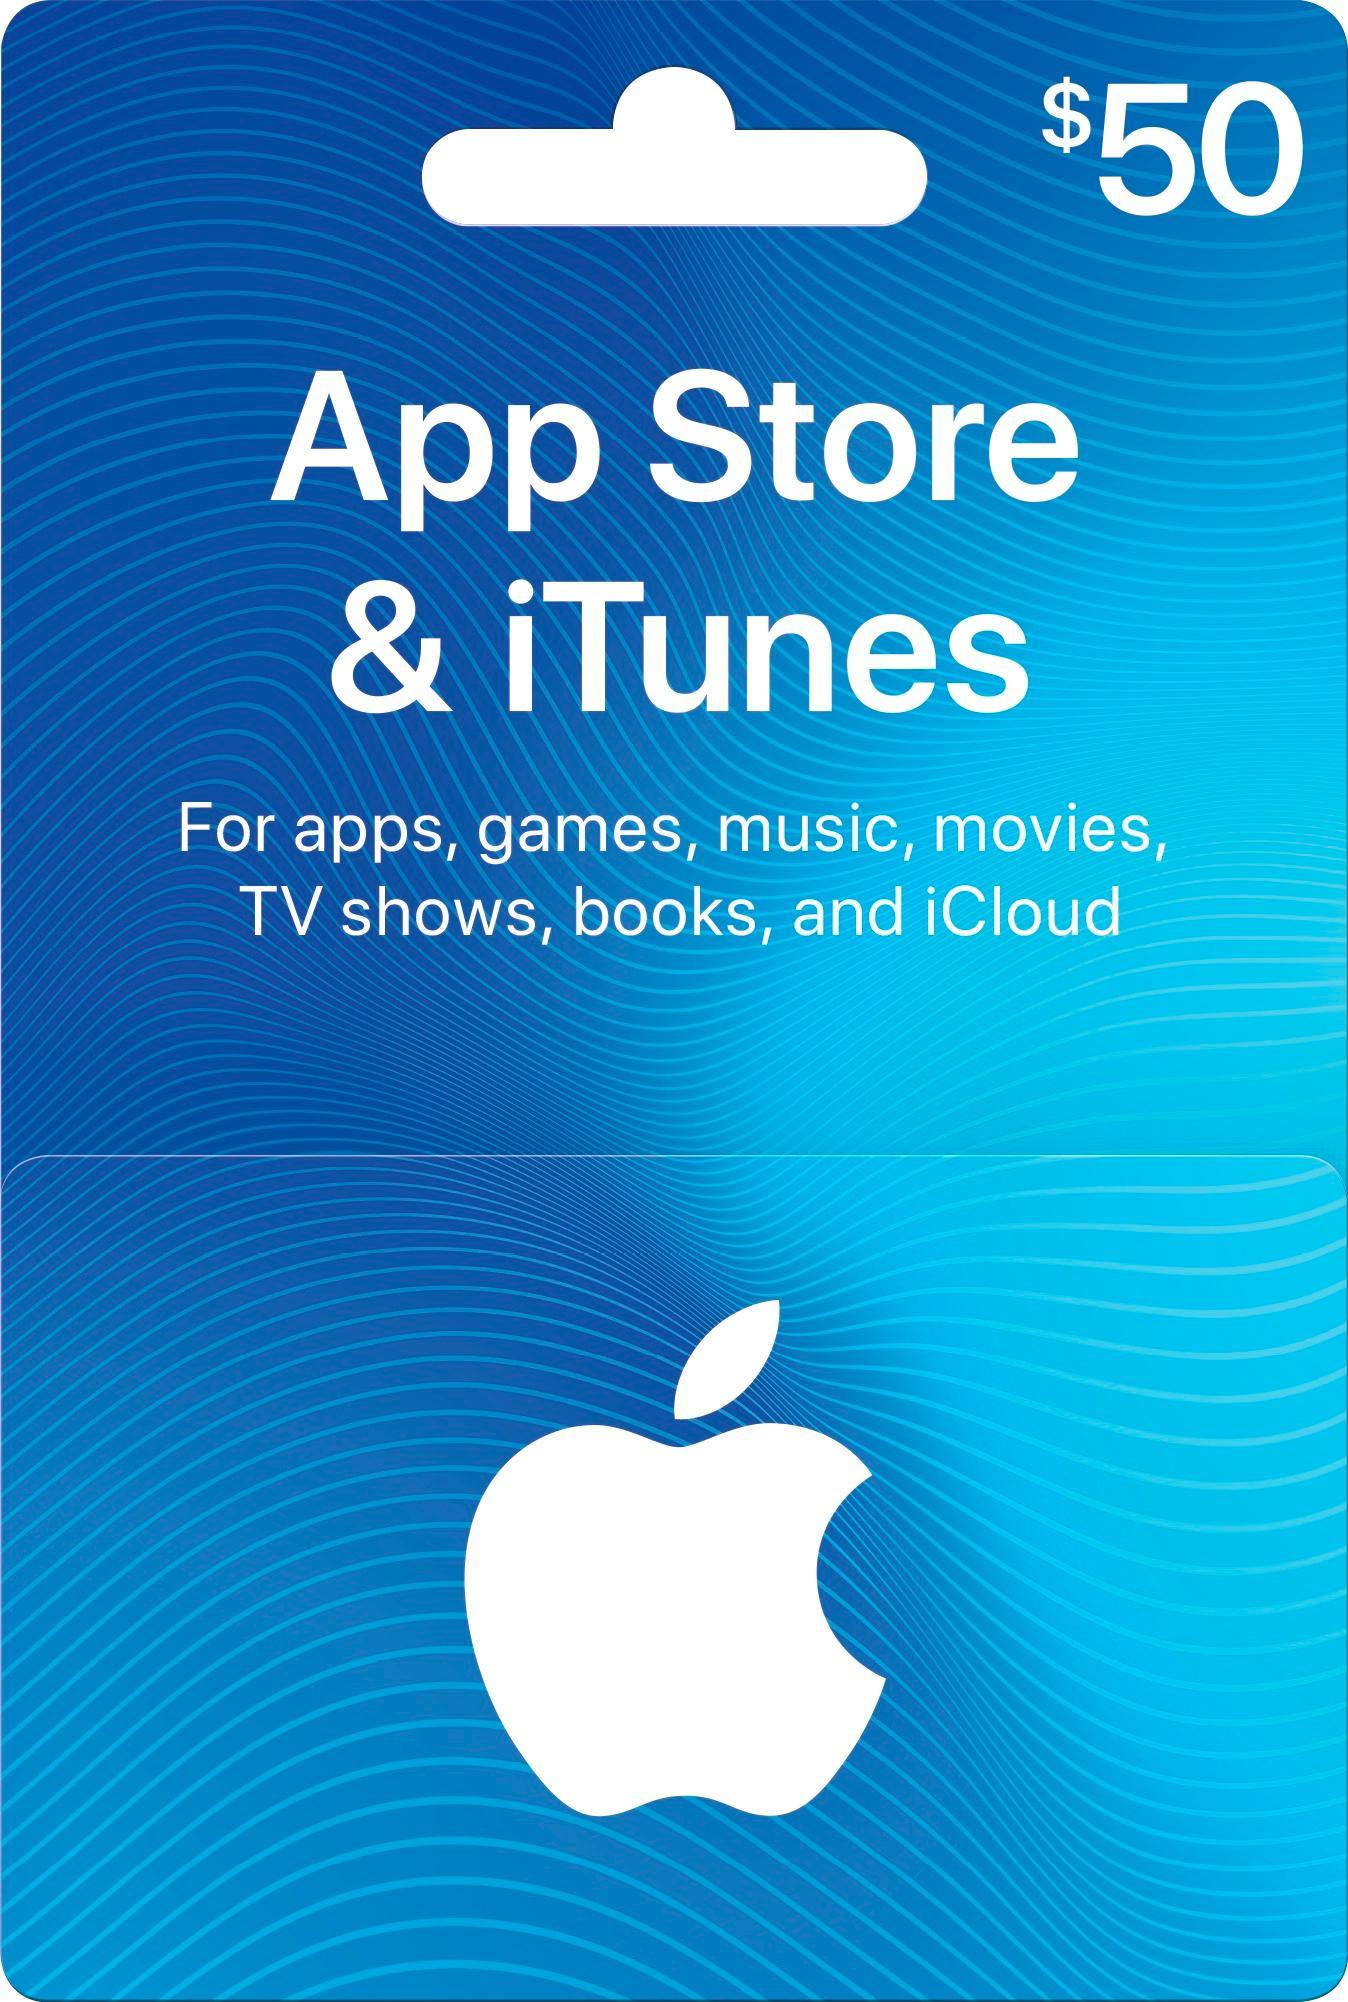 Apple ITUNES 0114 $50 largeFrontImage